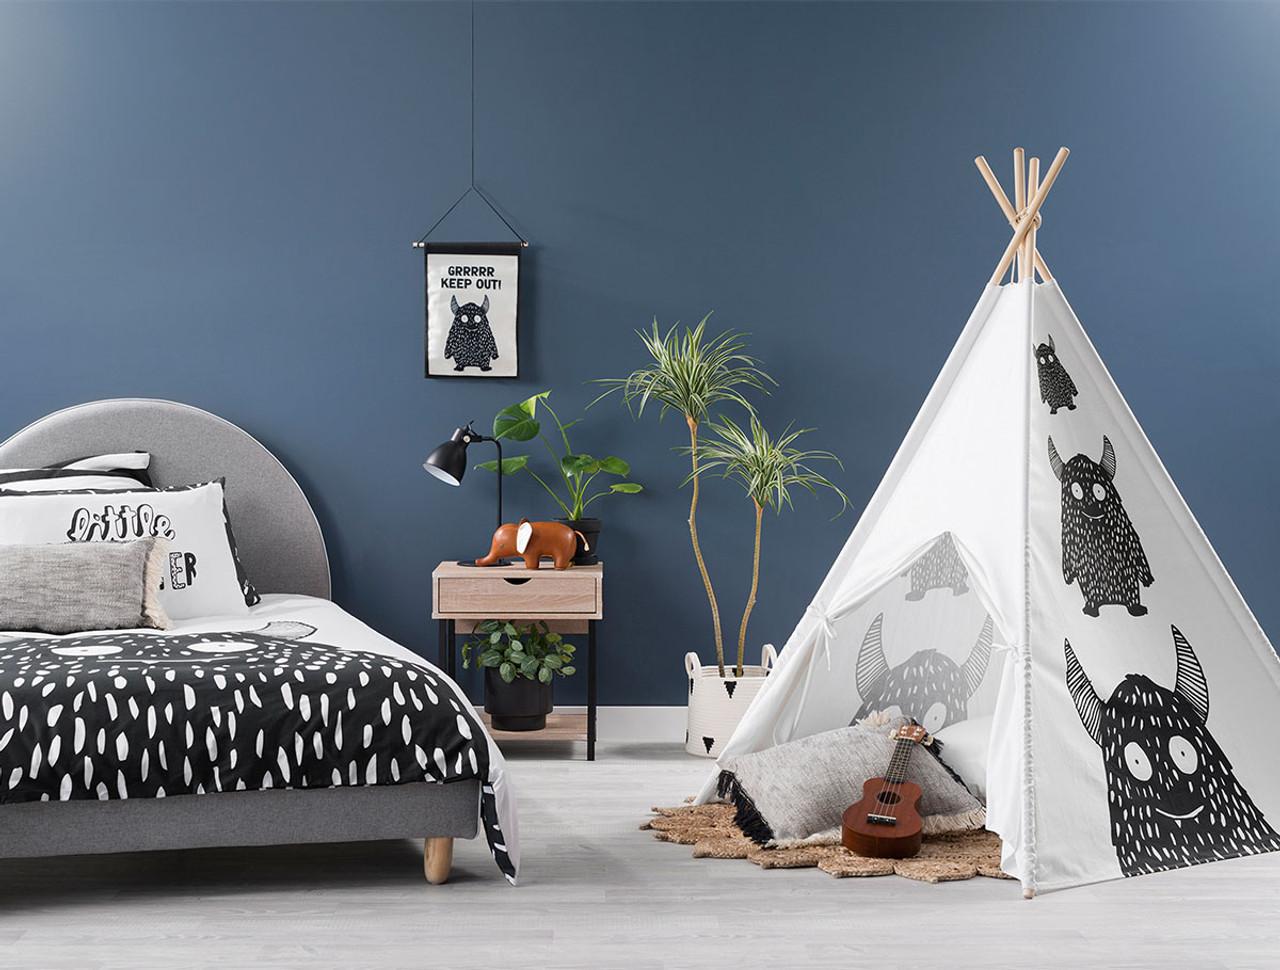 Designing Tips for Kids Bedrooms